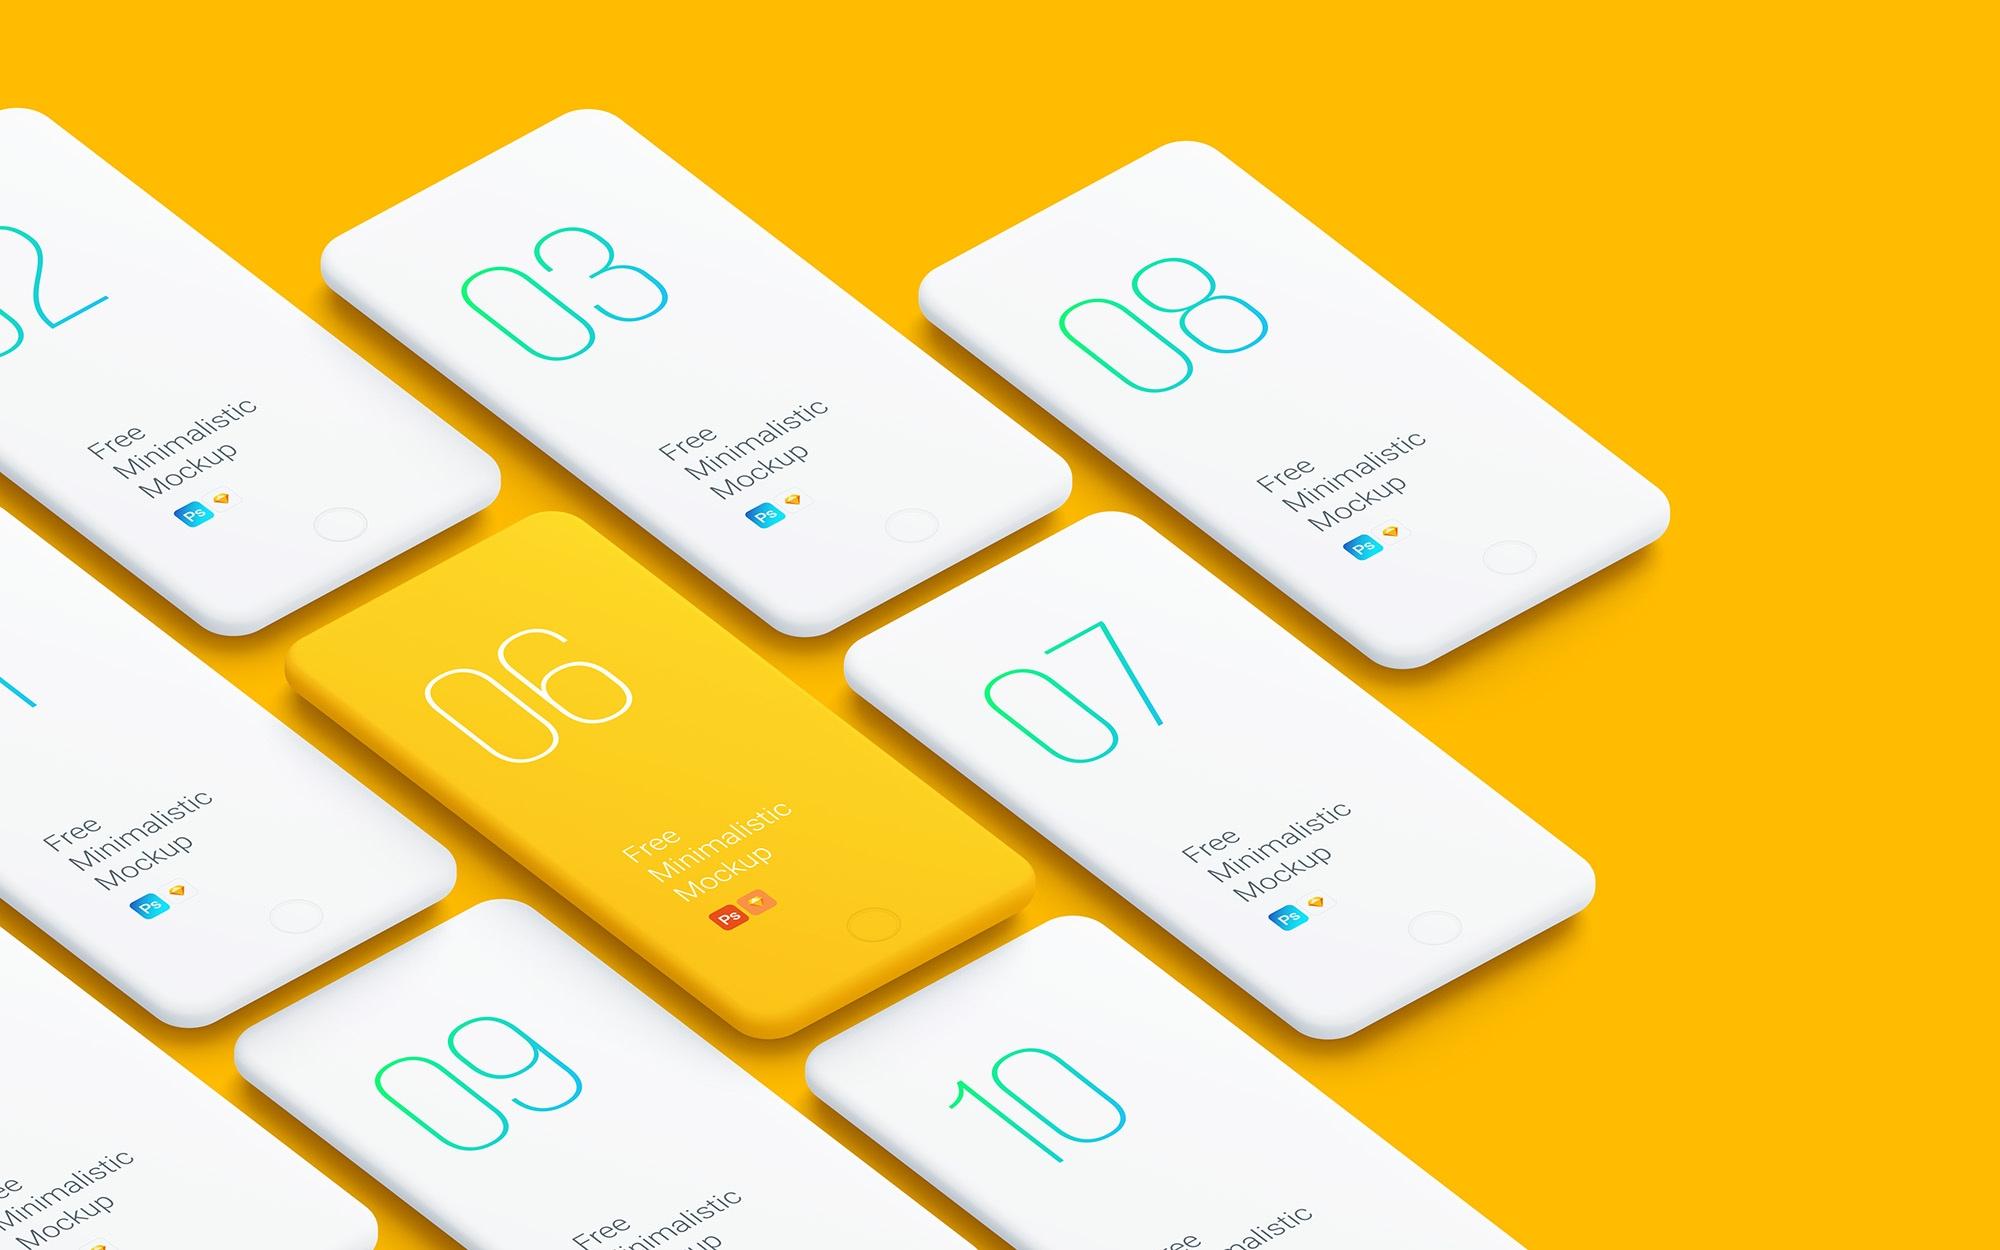 Minimalistic Smartphones Mockups - Free minimalistic mockups of smartphones for you – so you can showcase your app and web designs.